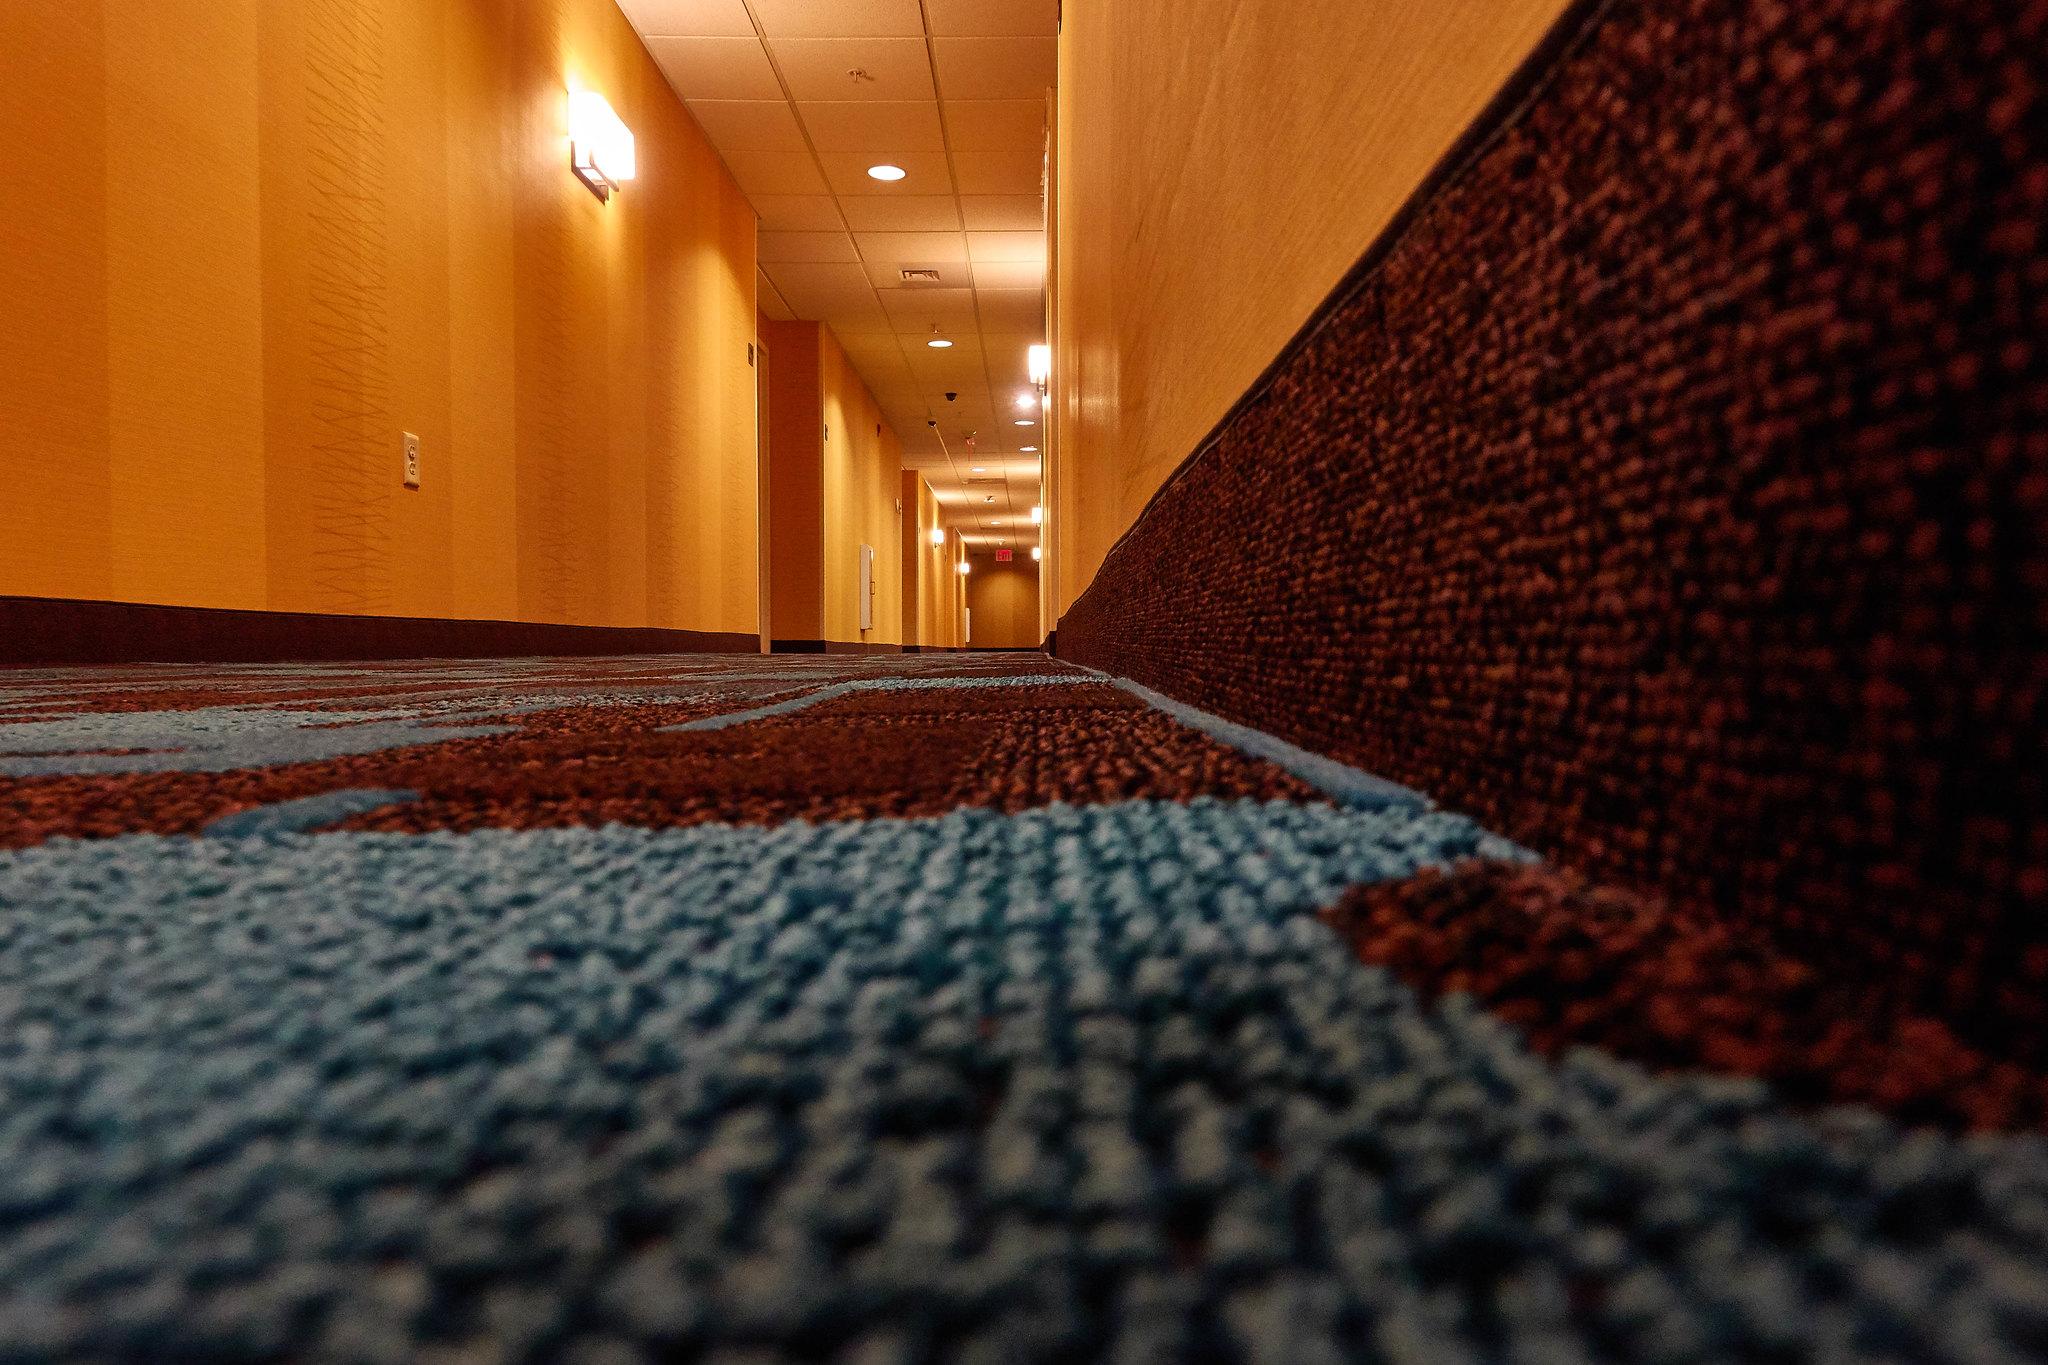 Hallway; Low Shot